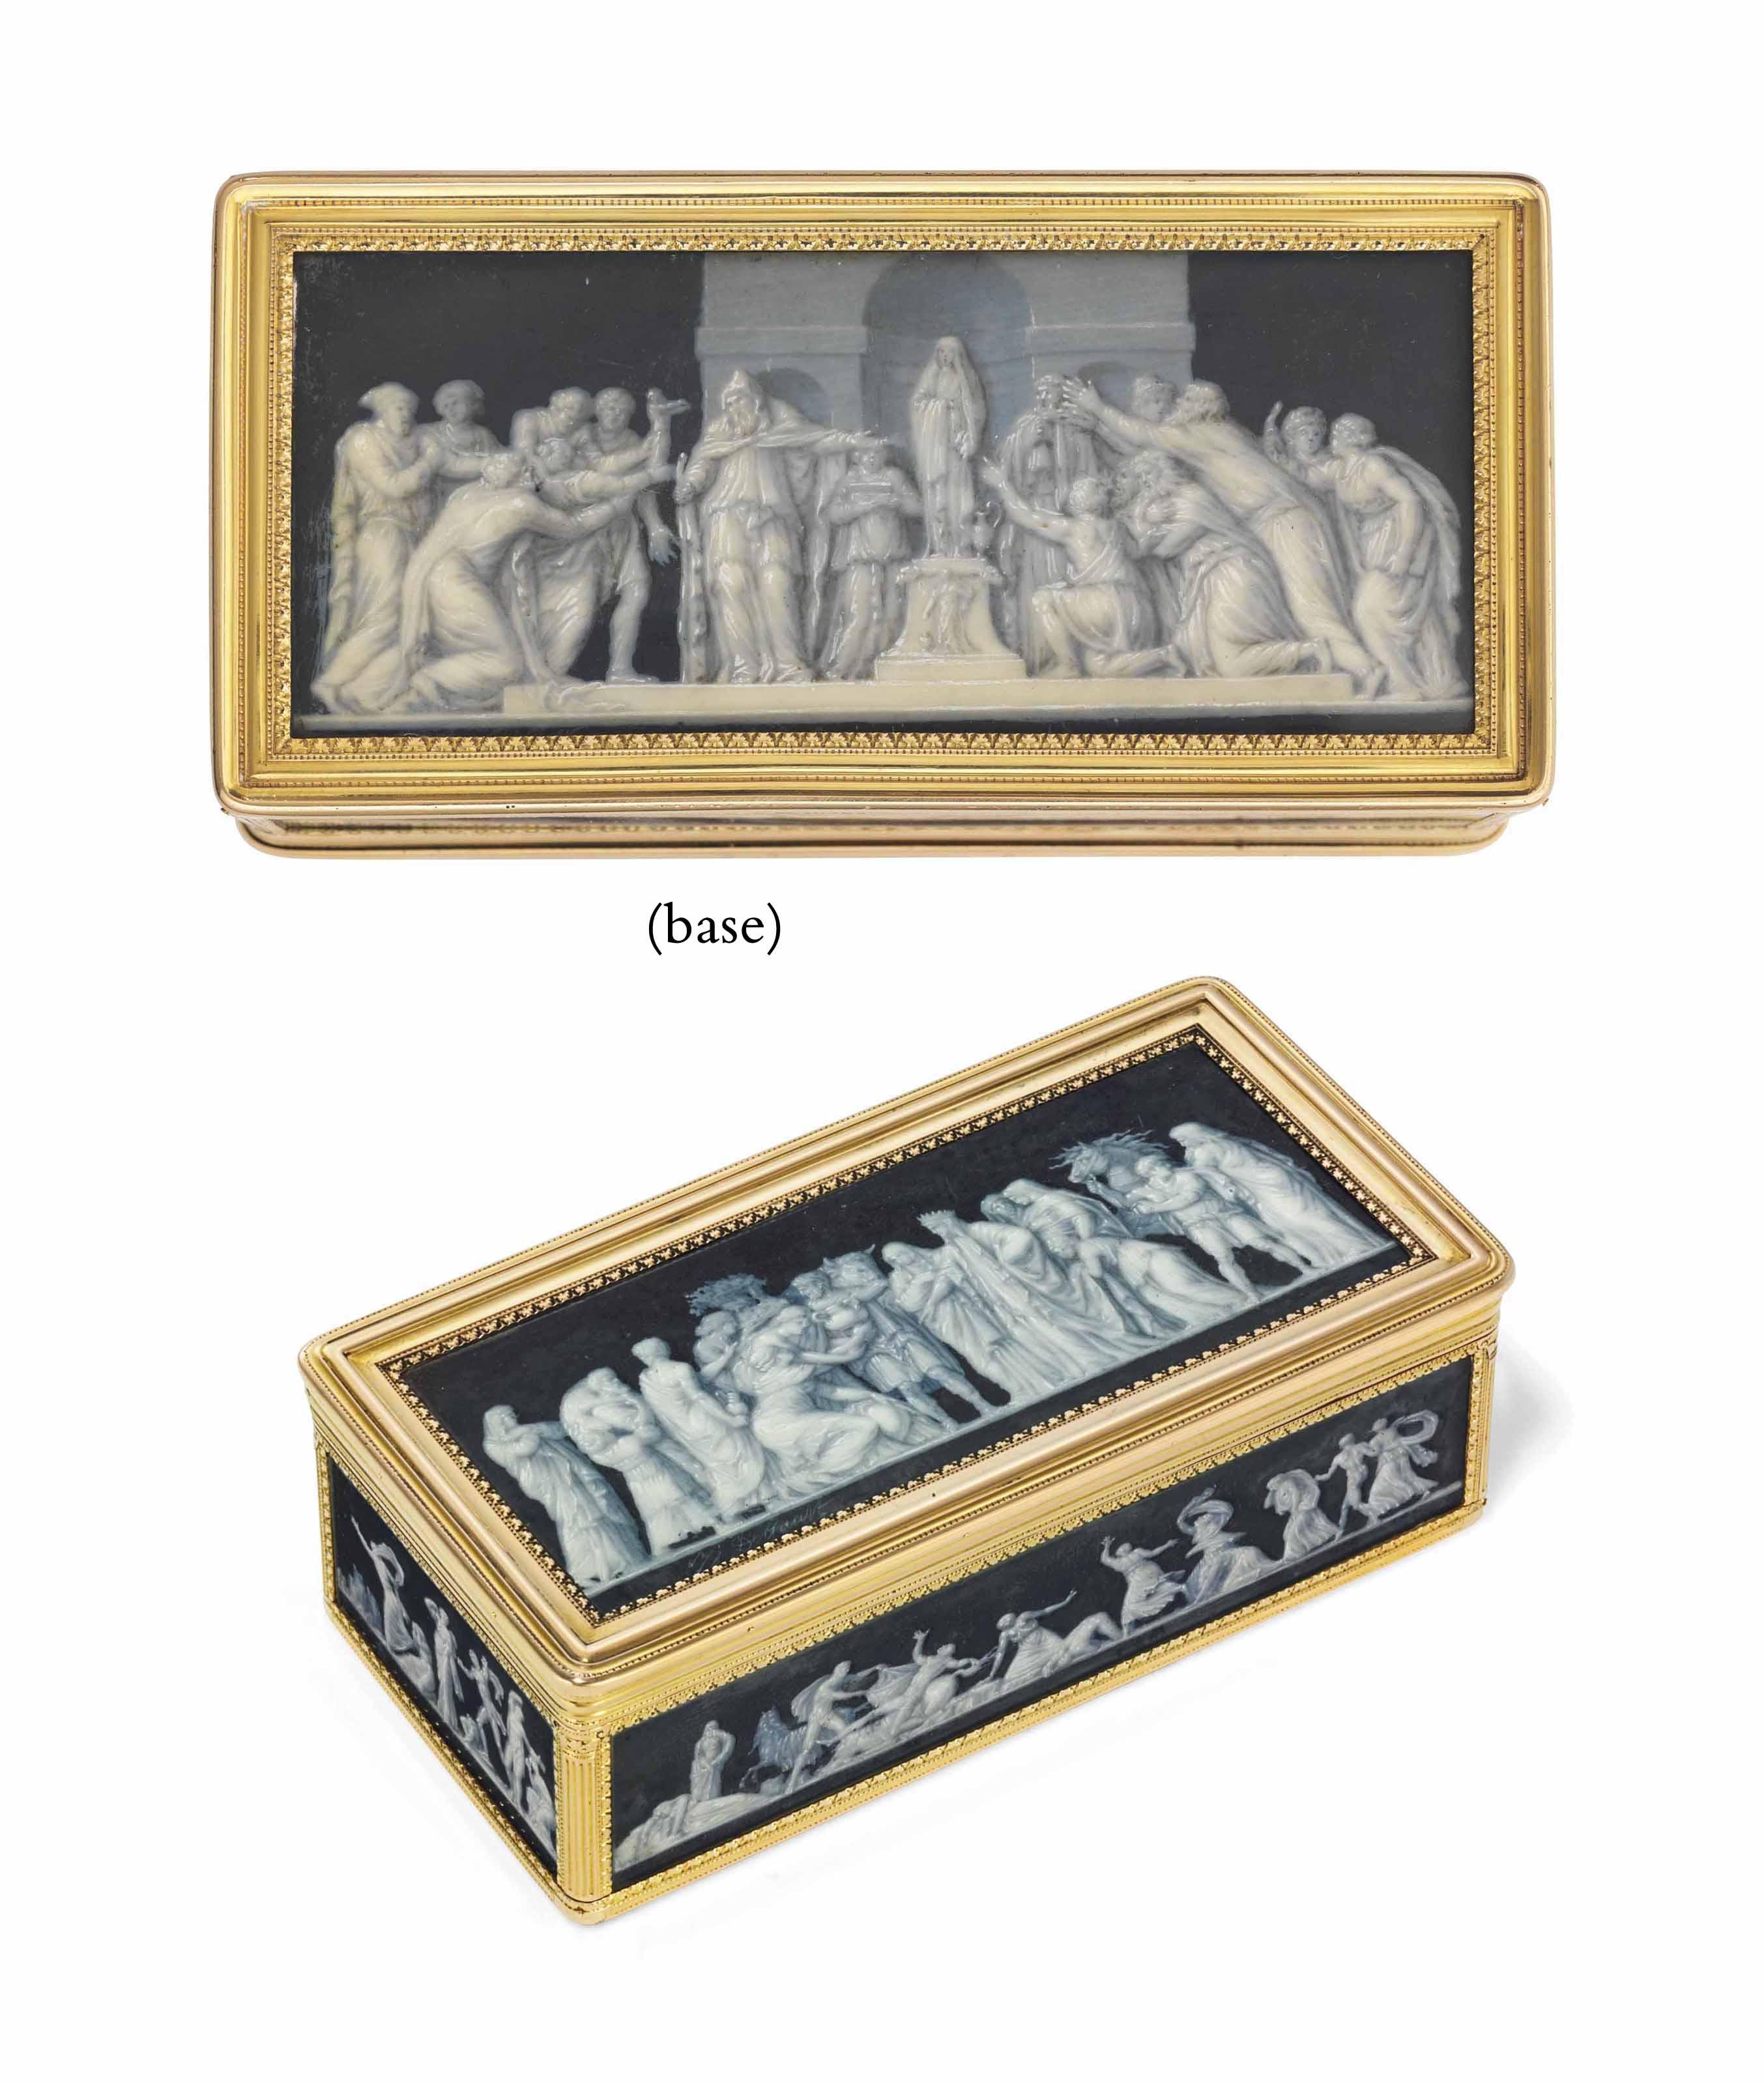 A LOUIS XVI GOLD-LINED BOITE-A-MINIATURES